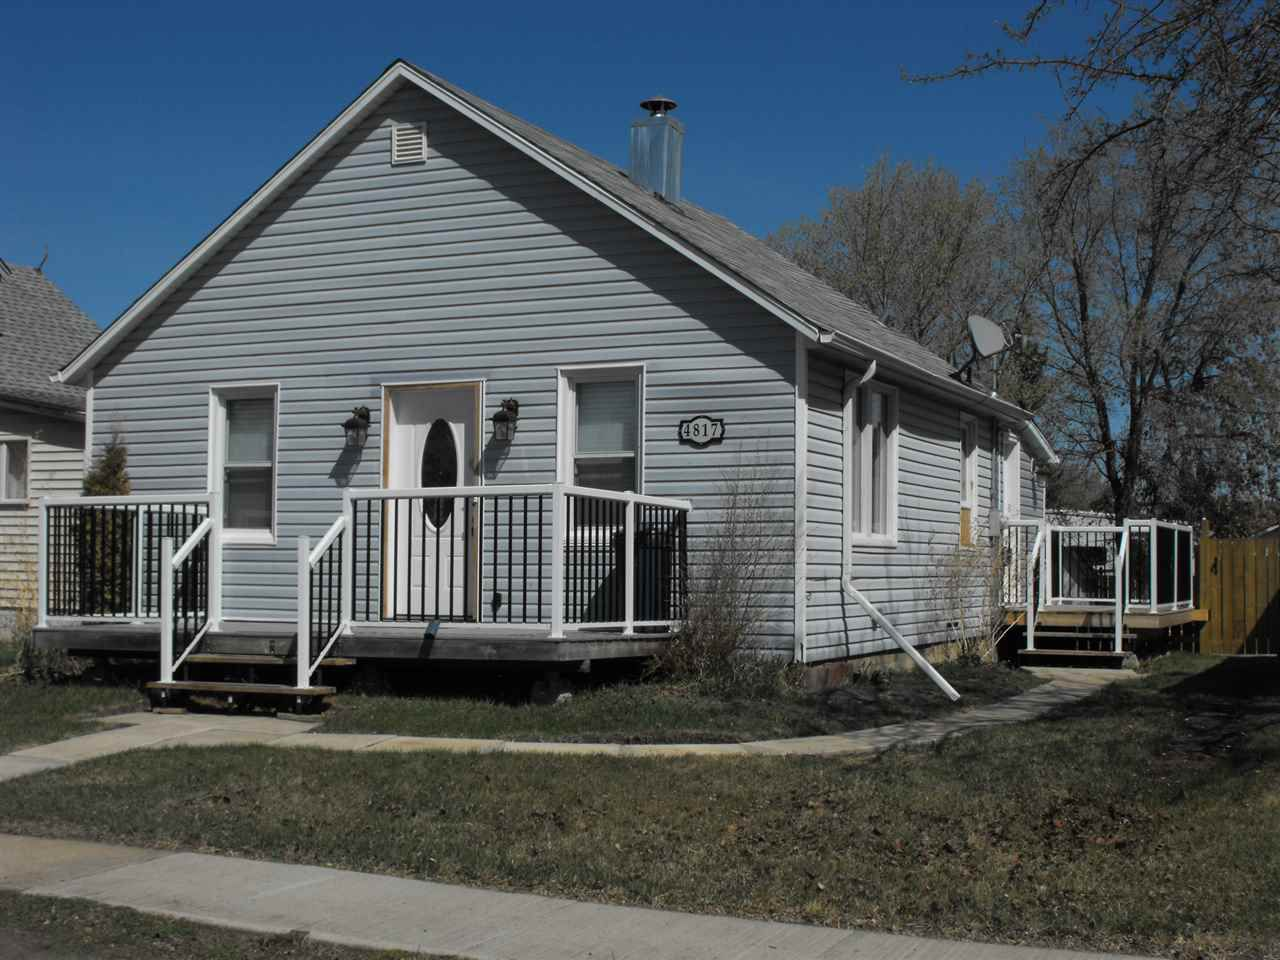 Main Photo: 4817 52 Street: Elk Point House for sale : MLS®# E4097538